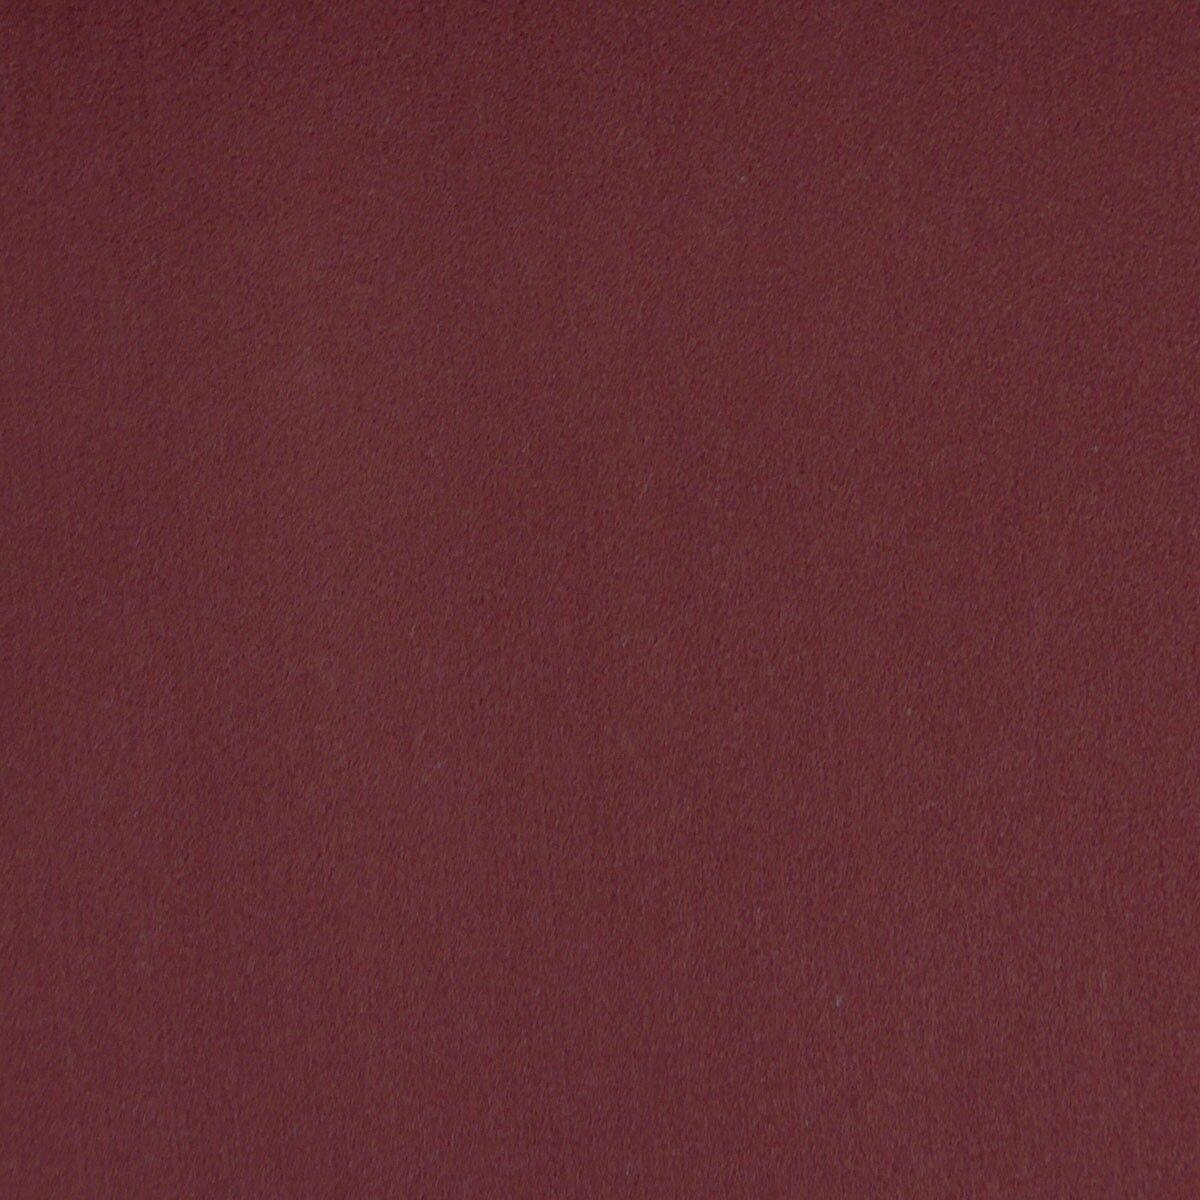 Kreativstoff Filz einfarbig dunkelrot 180cm Breite 2mm Stärke